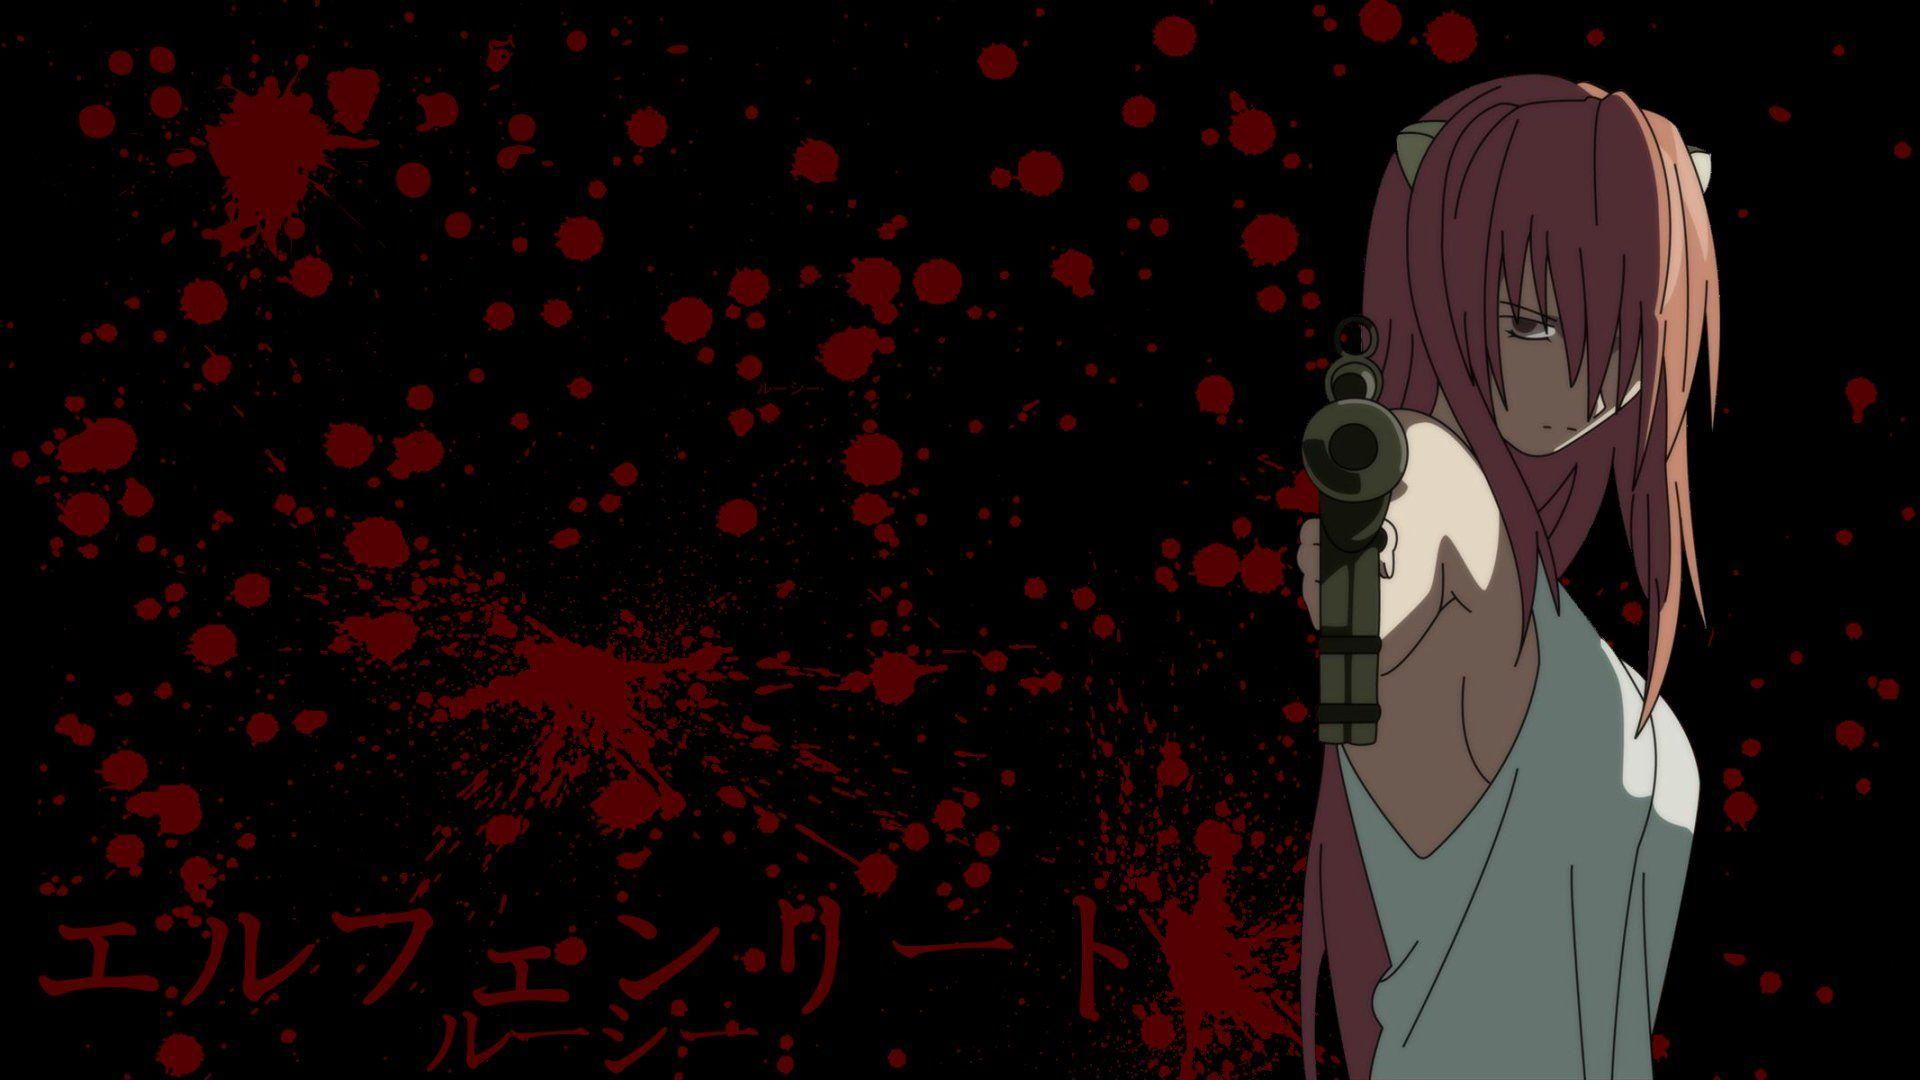 Anime Elfen Lied Lucy Elfen Lied Fondo De Pantalla Anime